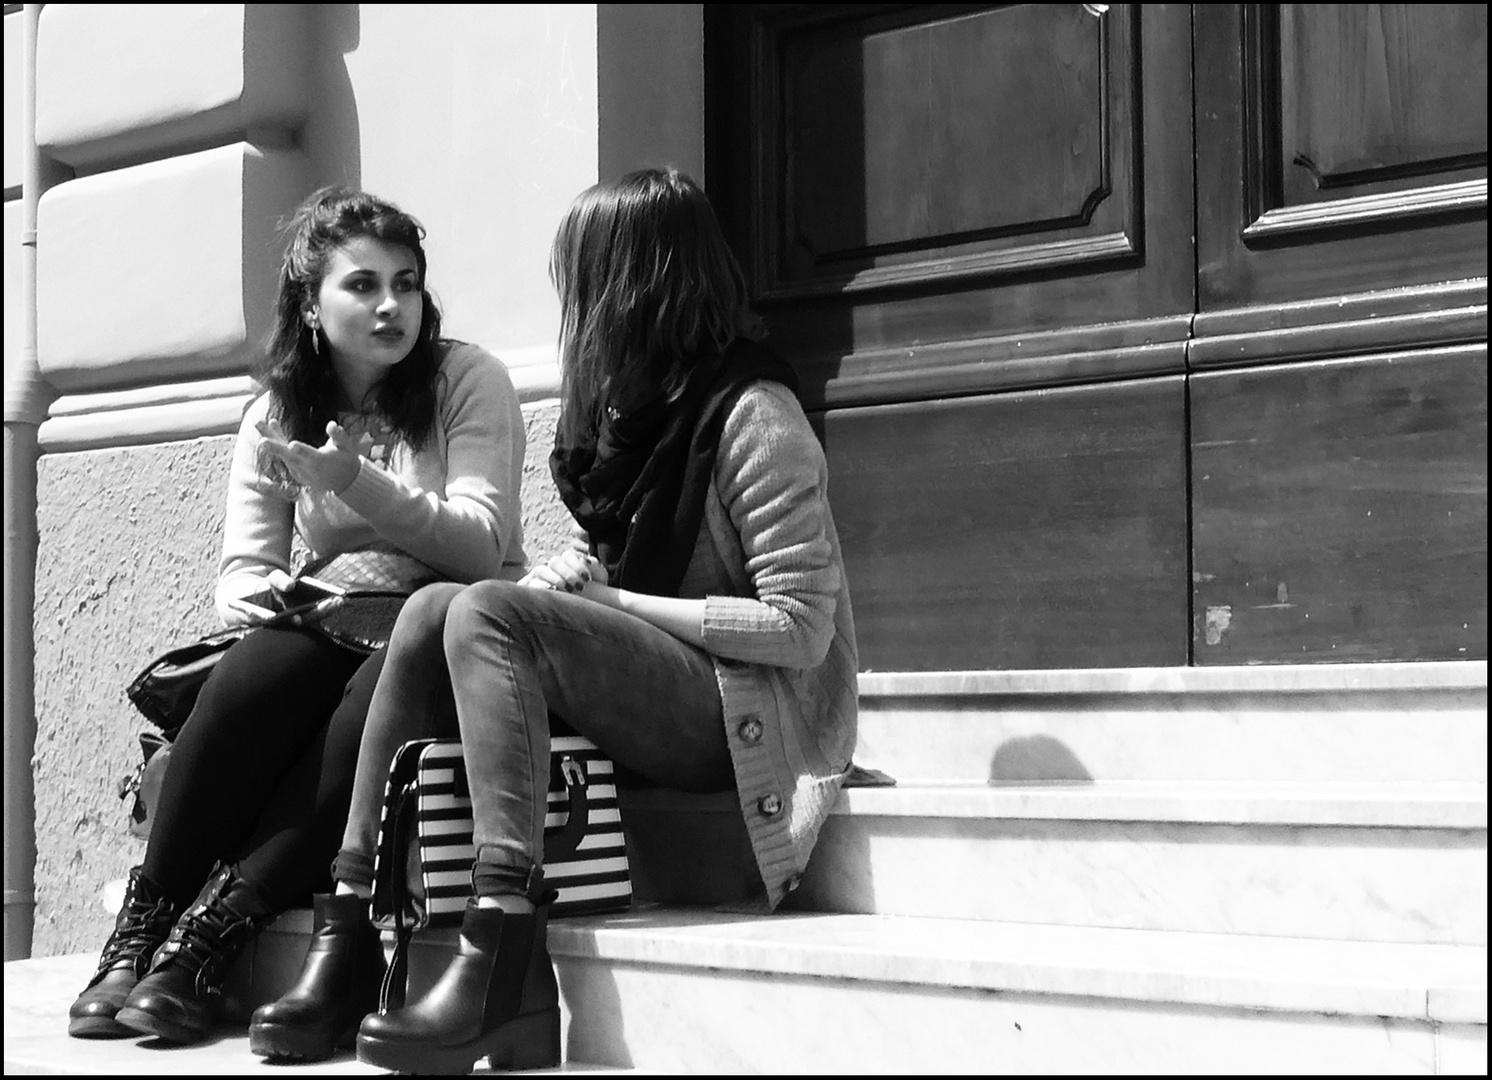 Neapolitan Girlfriends